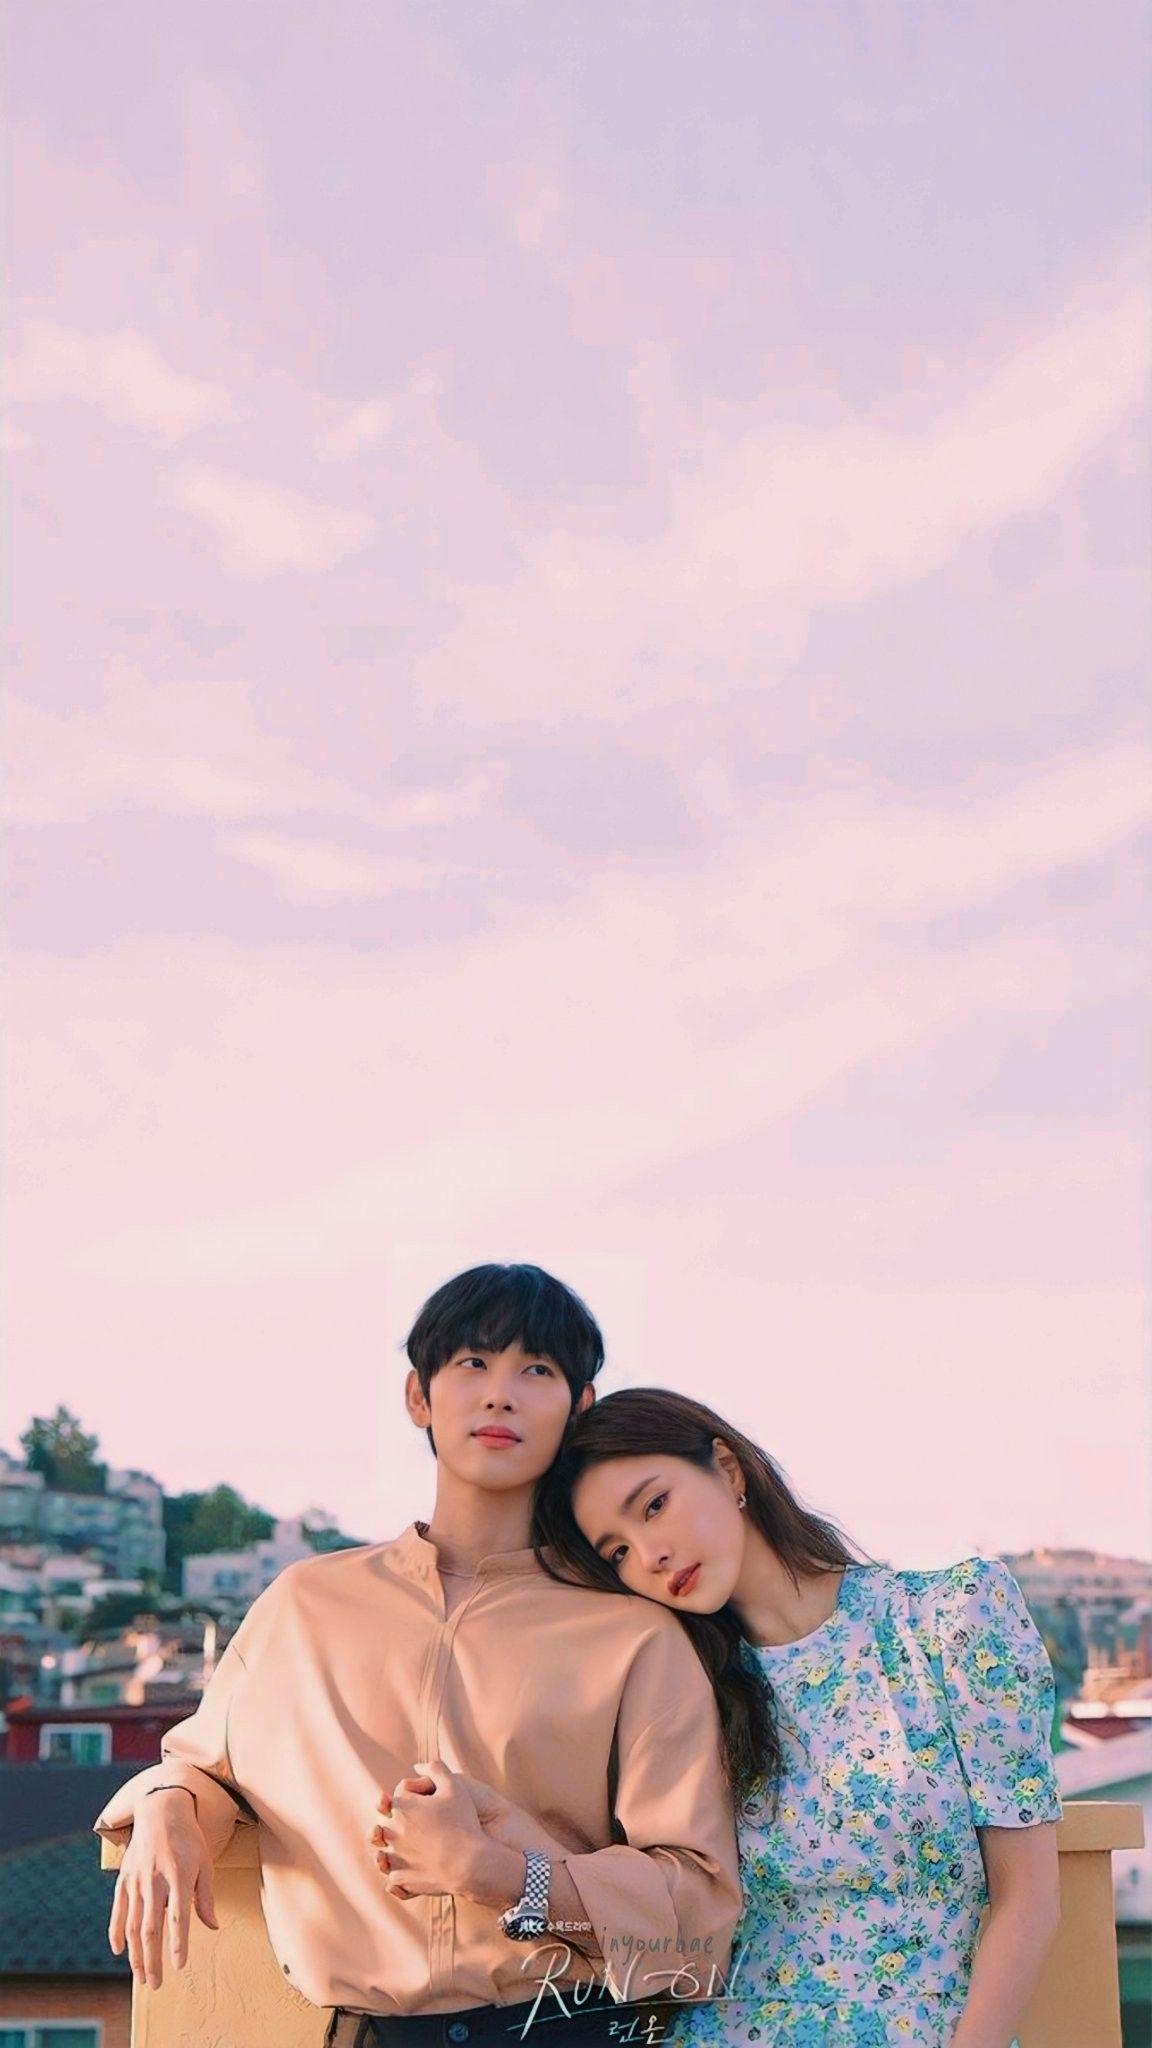 670 Lovely Dramas Ideas In 2021 Korean Drama Kdrama Drama